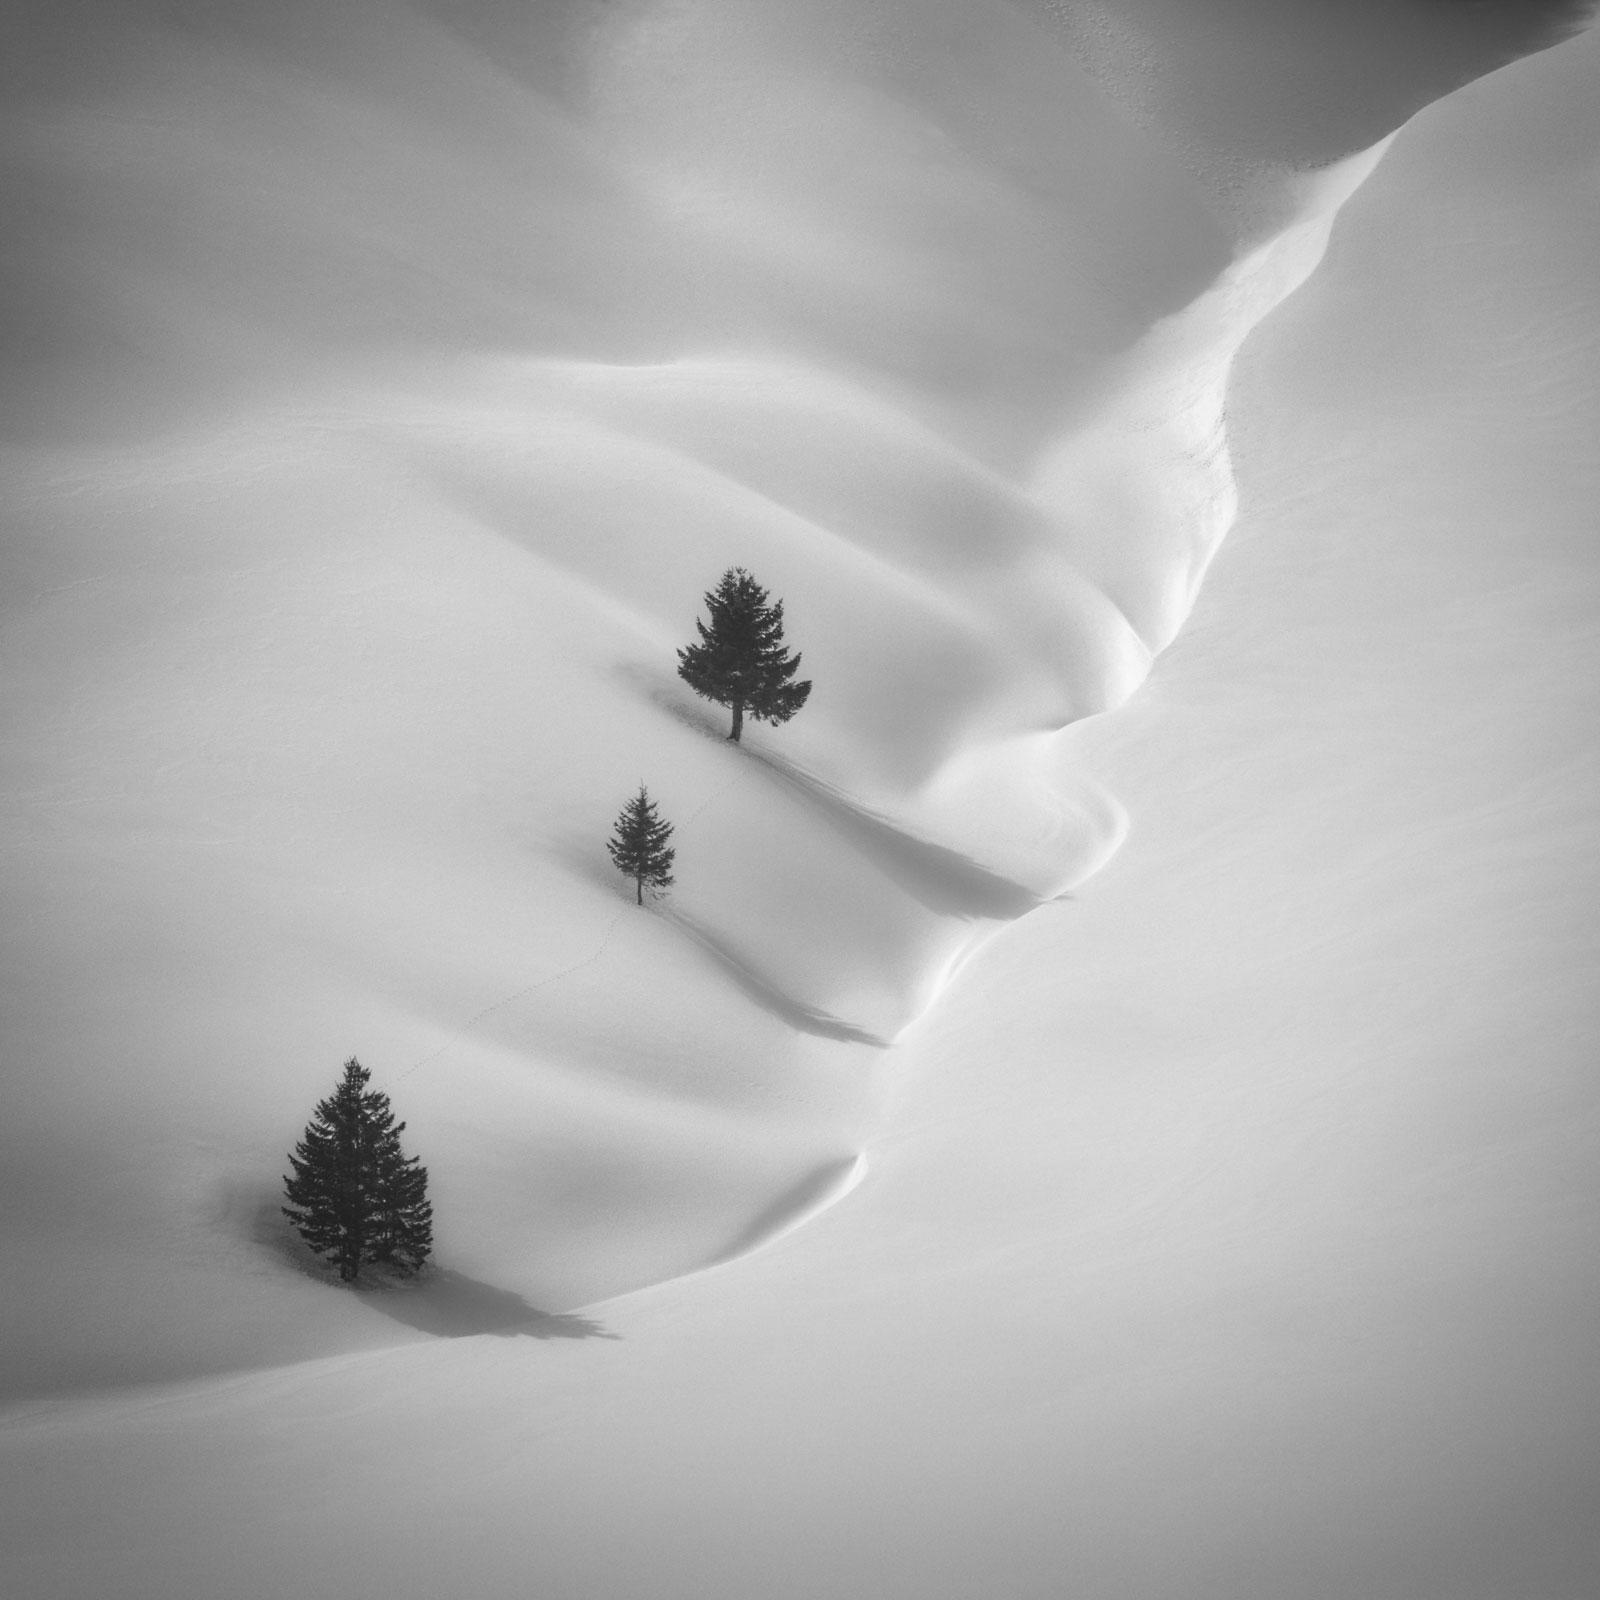 Rene Algesheimer Photography